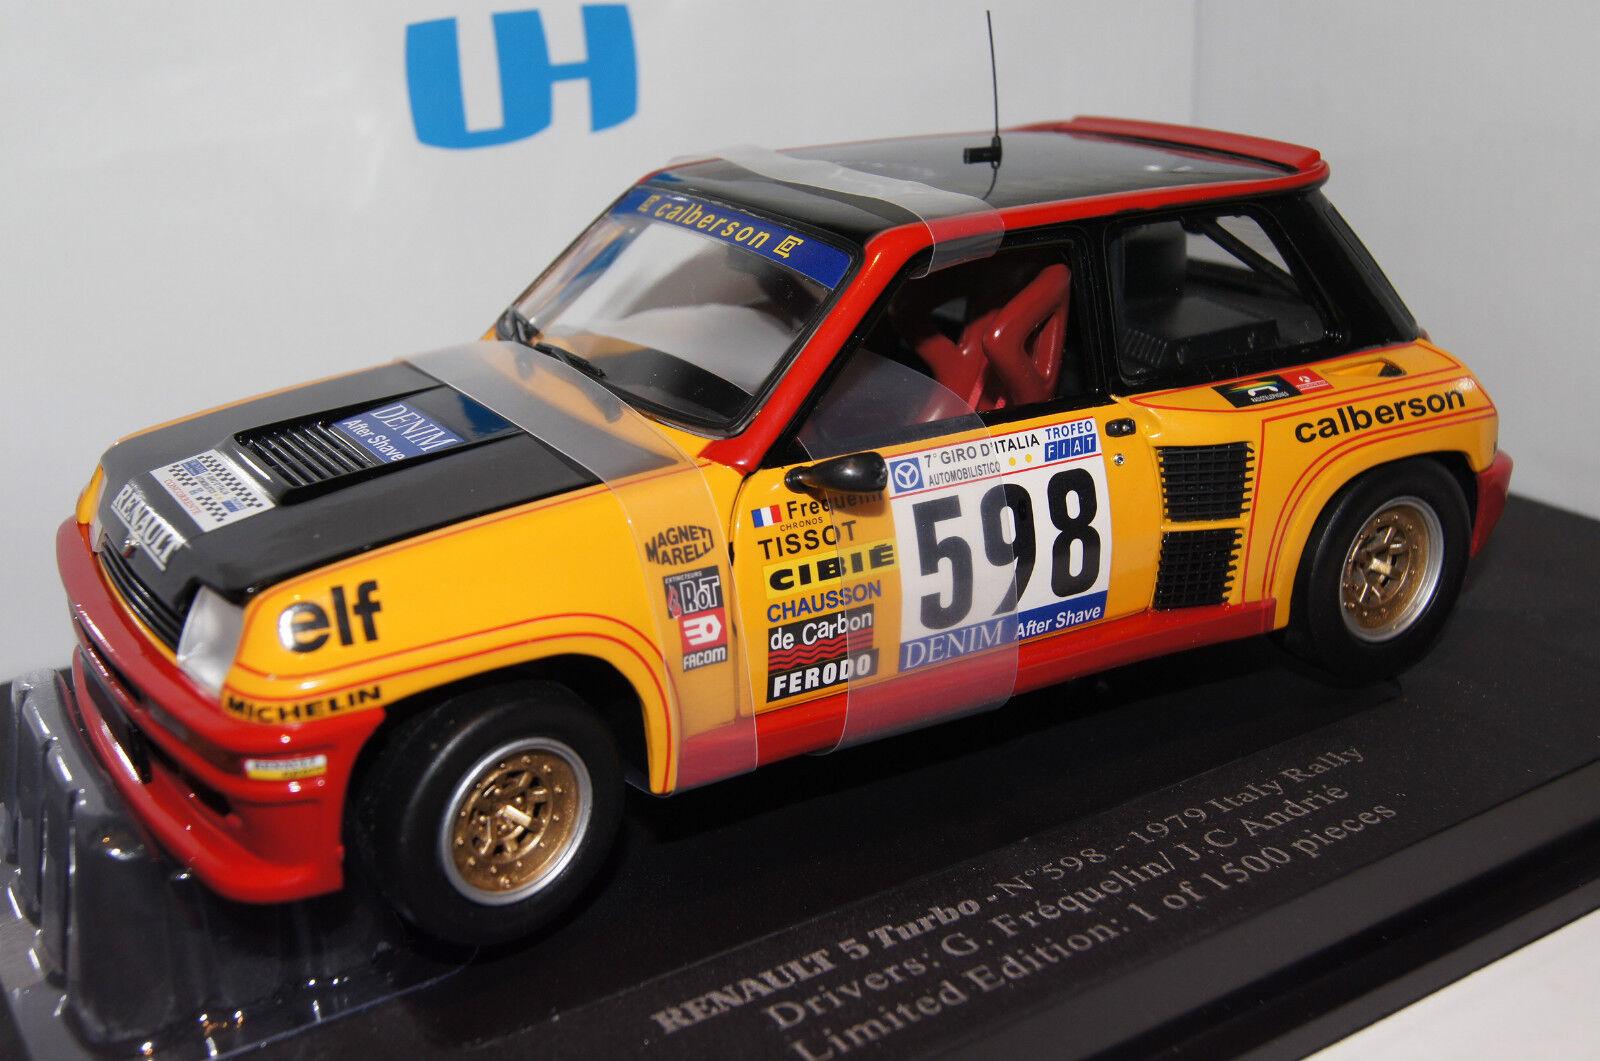 RENAULT 5 Turbo Rally Italia 1979 #598 1:18 UH NUOVO & OVP 4552